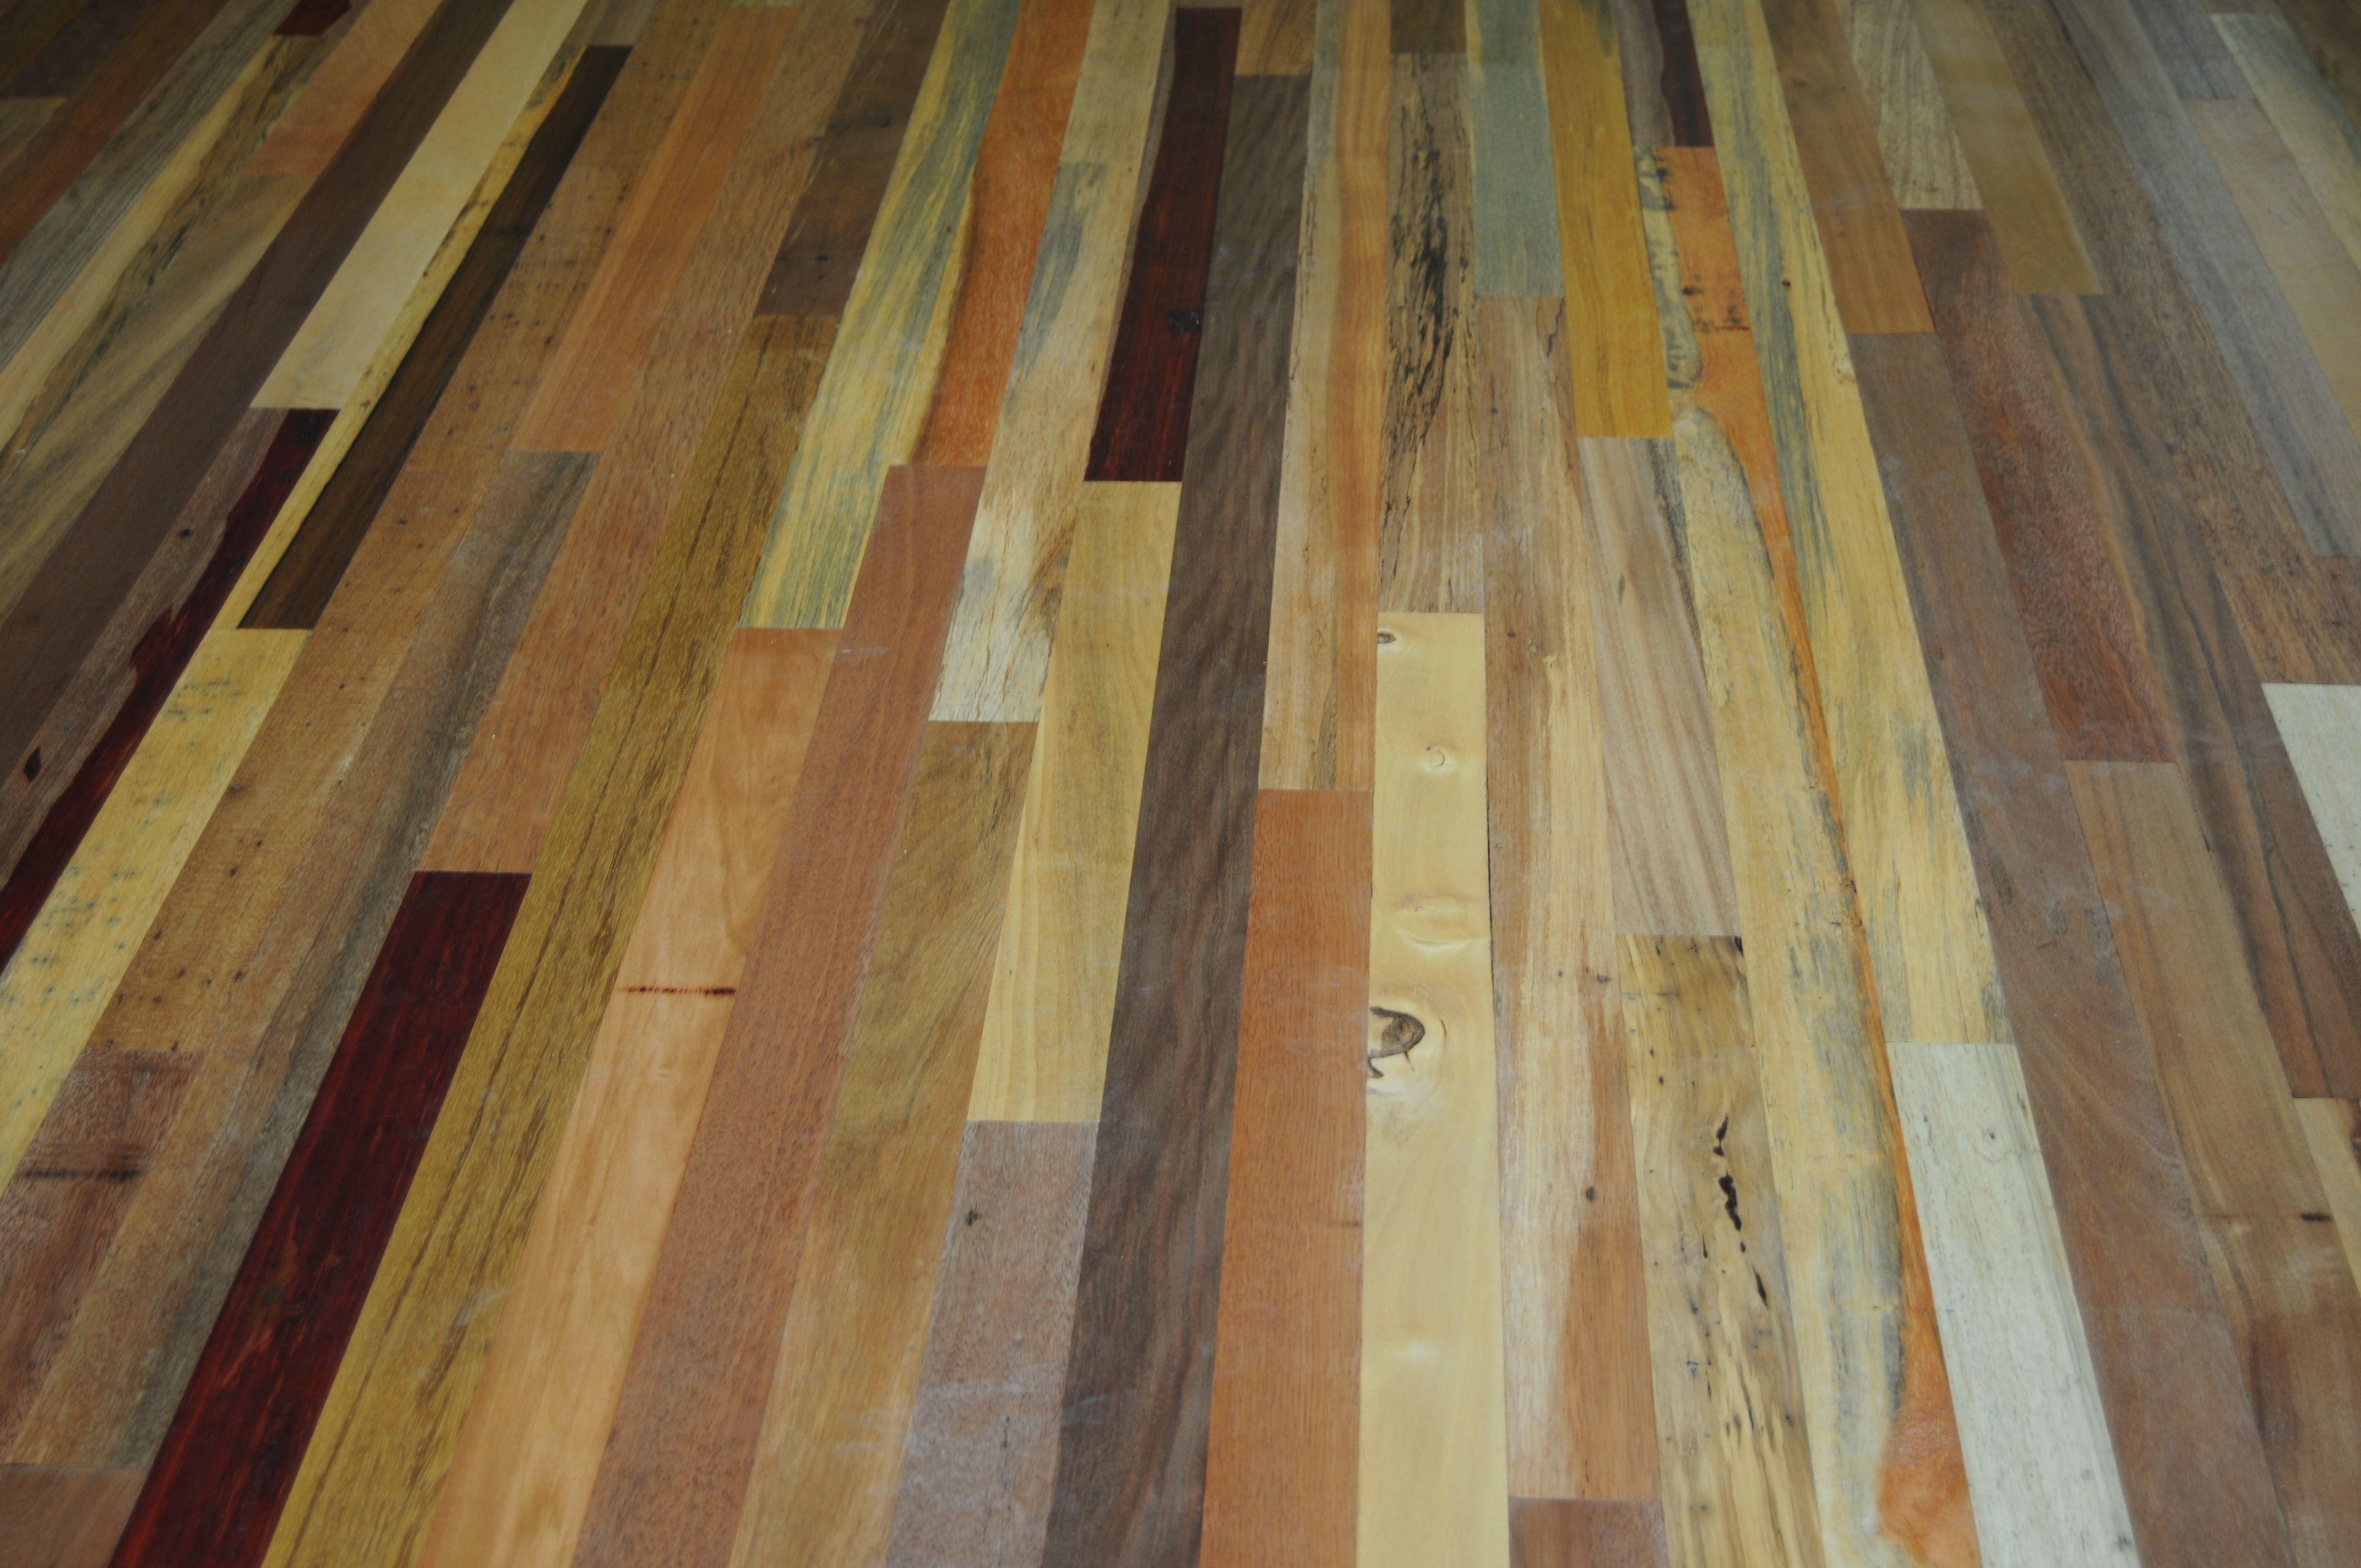 hardwood floors  Detail of reclaimed mixed exotic